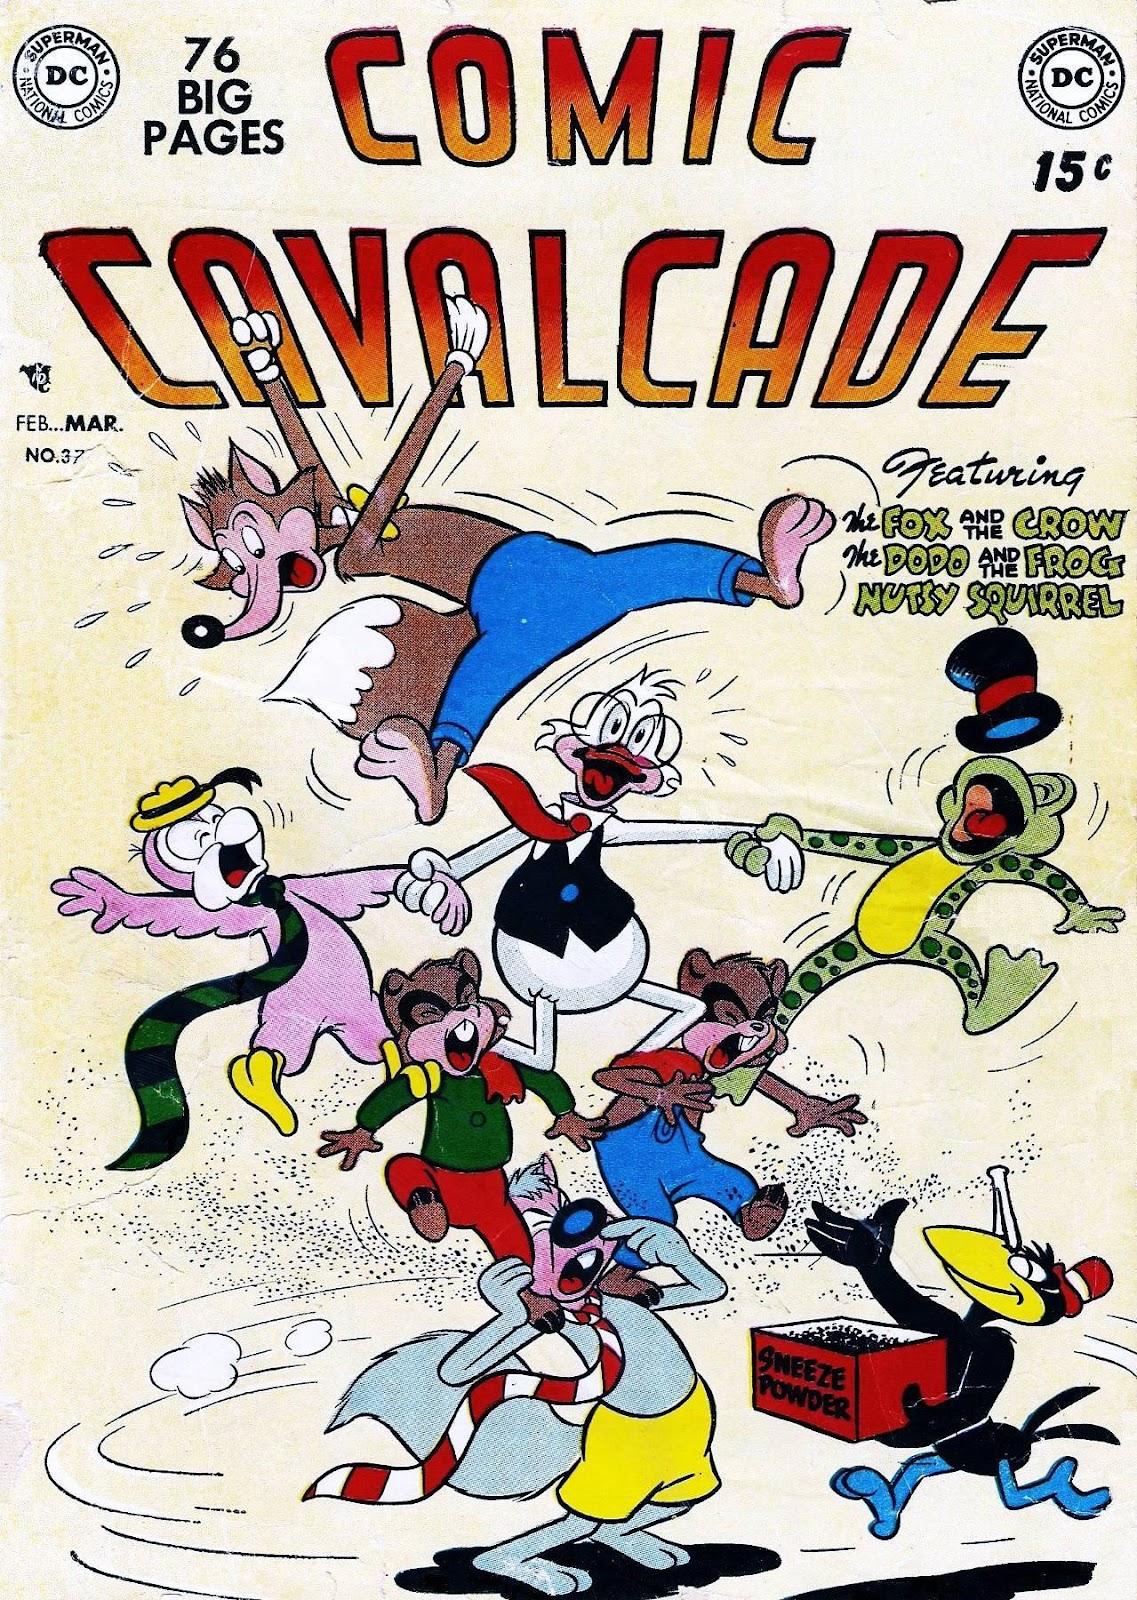 Comic Cavalcade issue 37 - Page 1